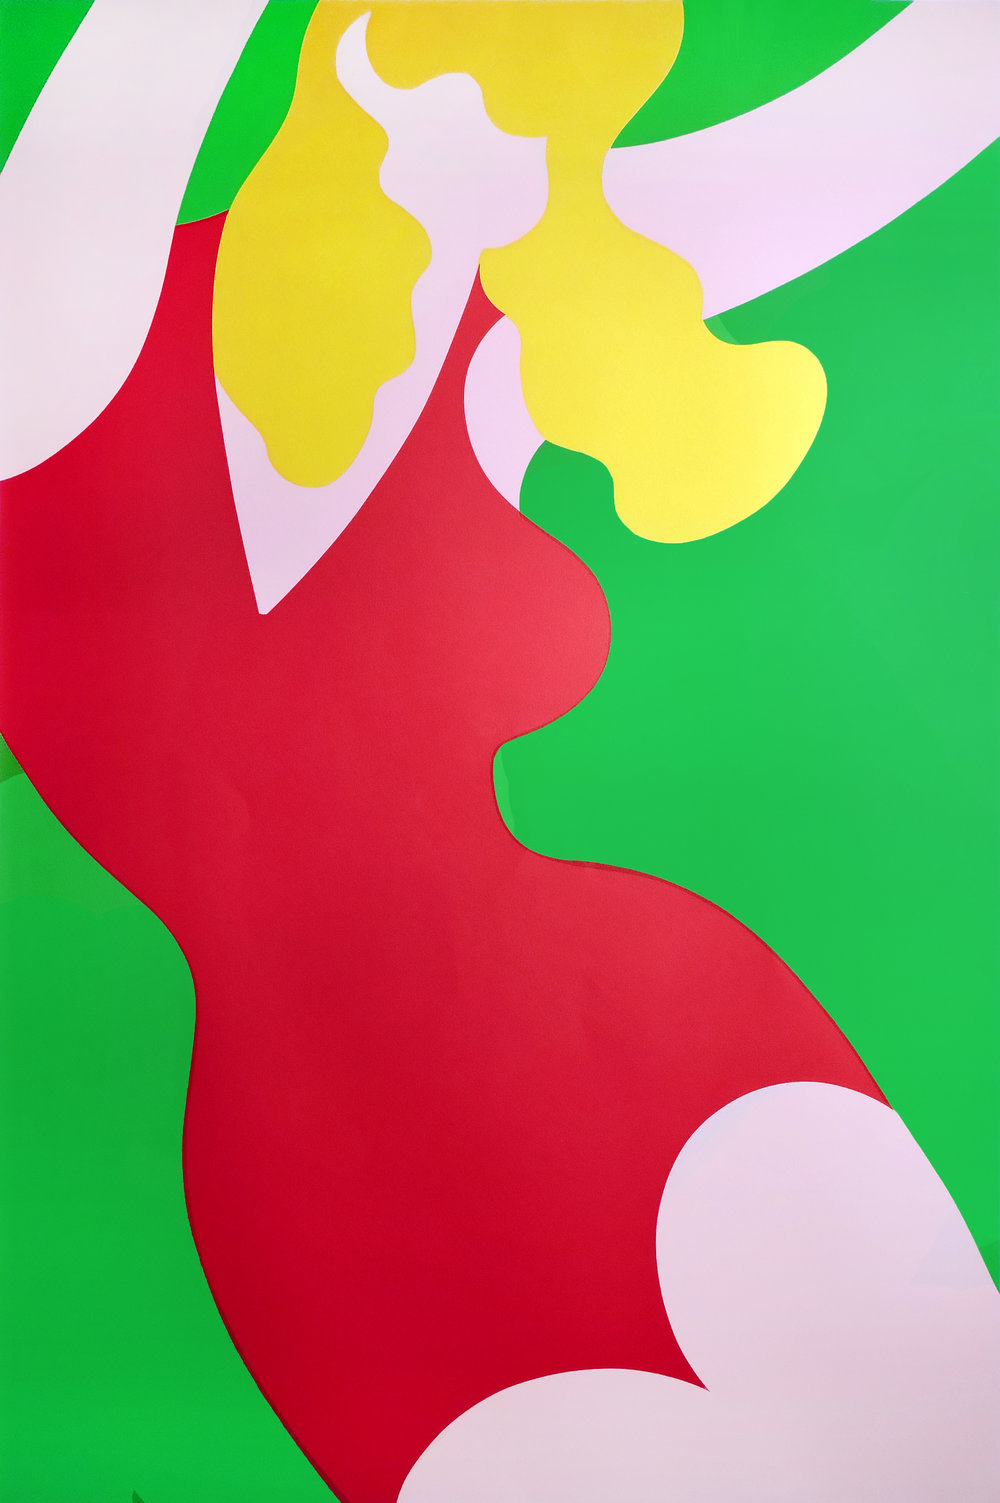 Carleton Varney,  Big Blonde , 1972. Print on Paper Edition 16/50, 39 x 26.5 in. (99 x 67.3 cm)